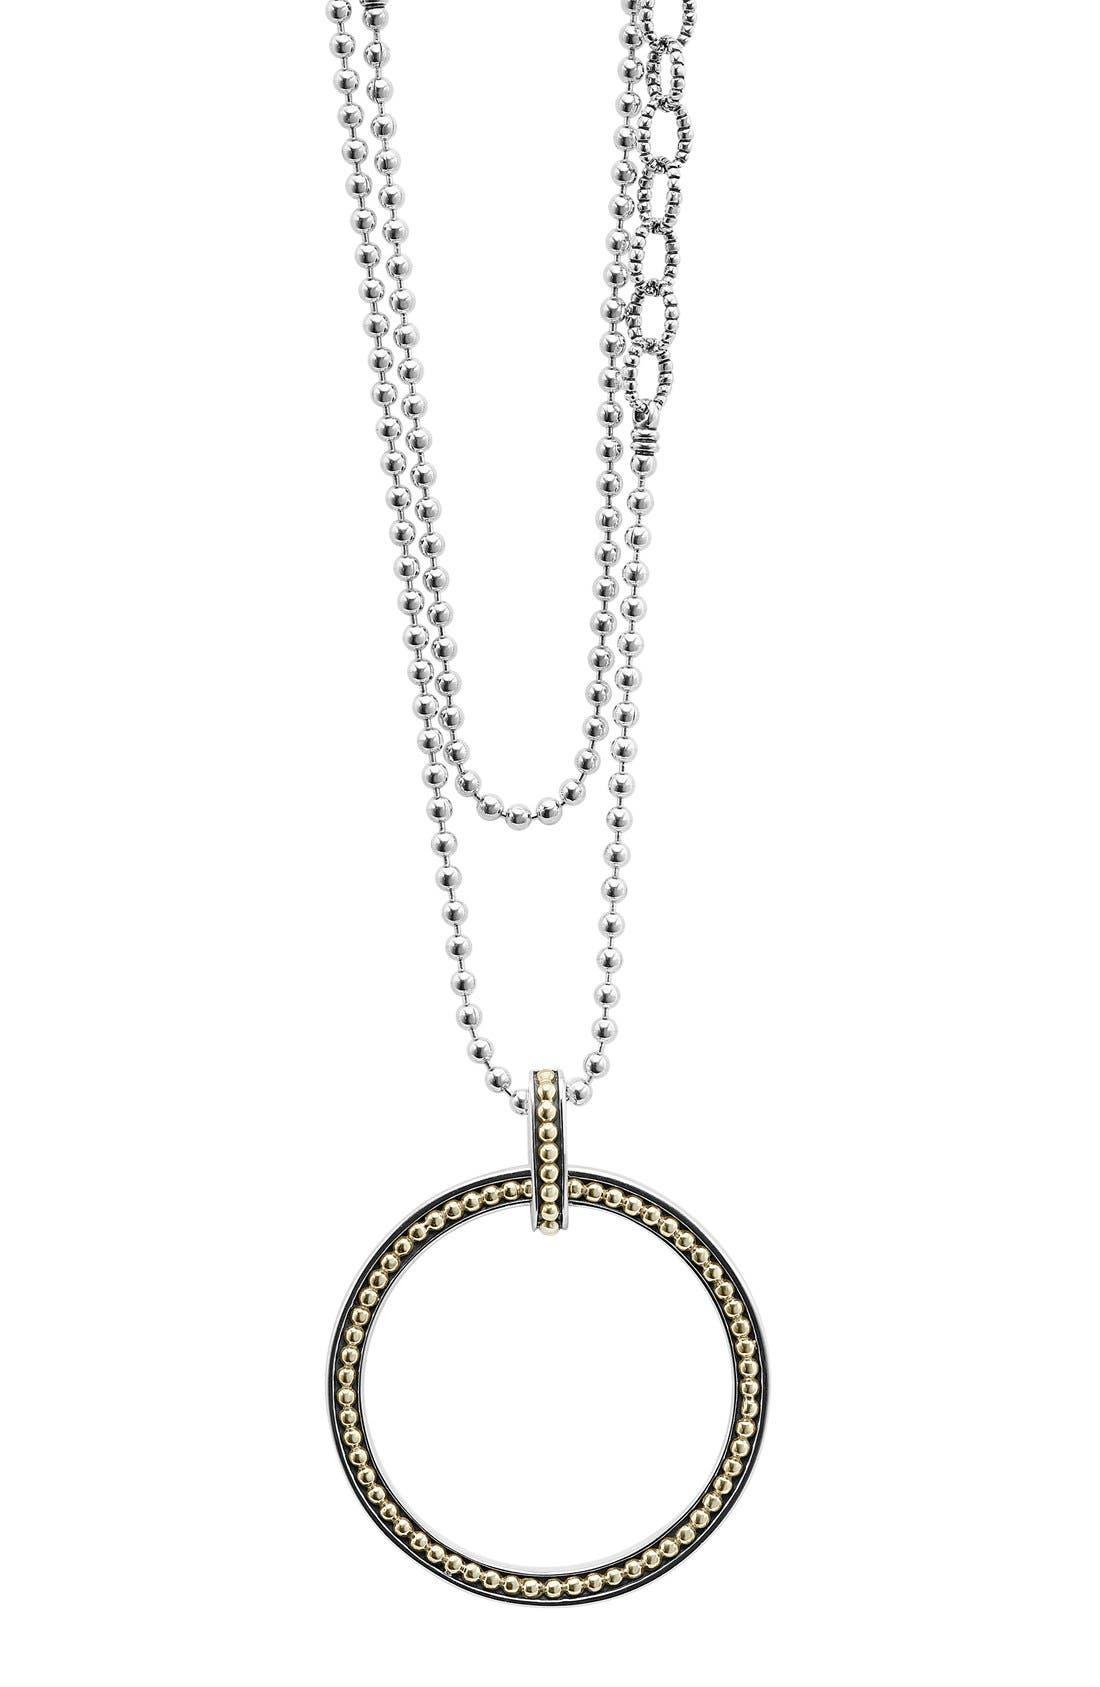 Enso Long Pendant Necklace,                         Main,                         color, SILVER/ GOLD